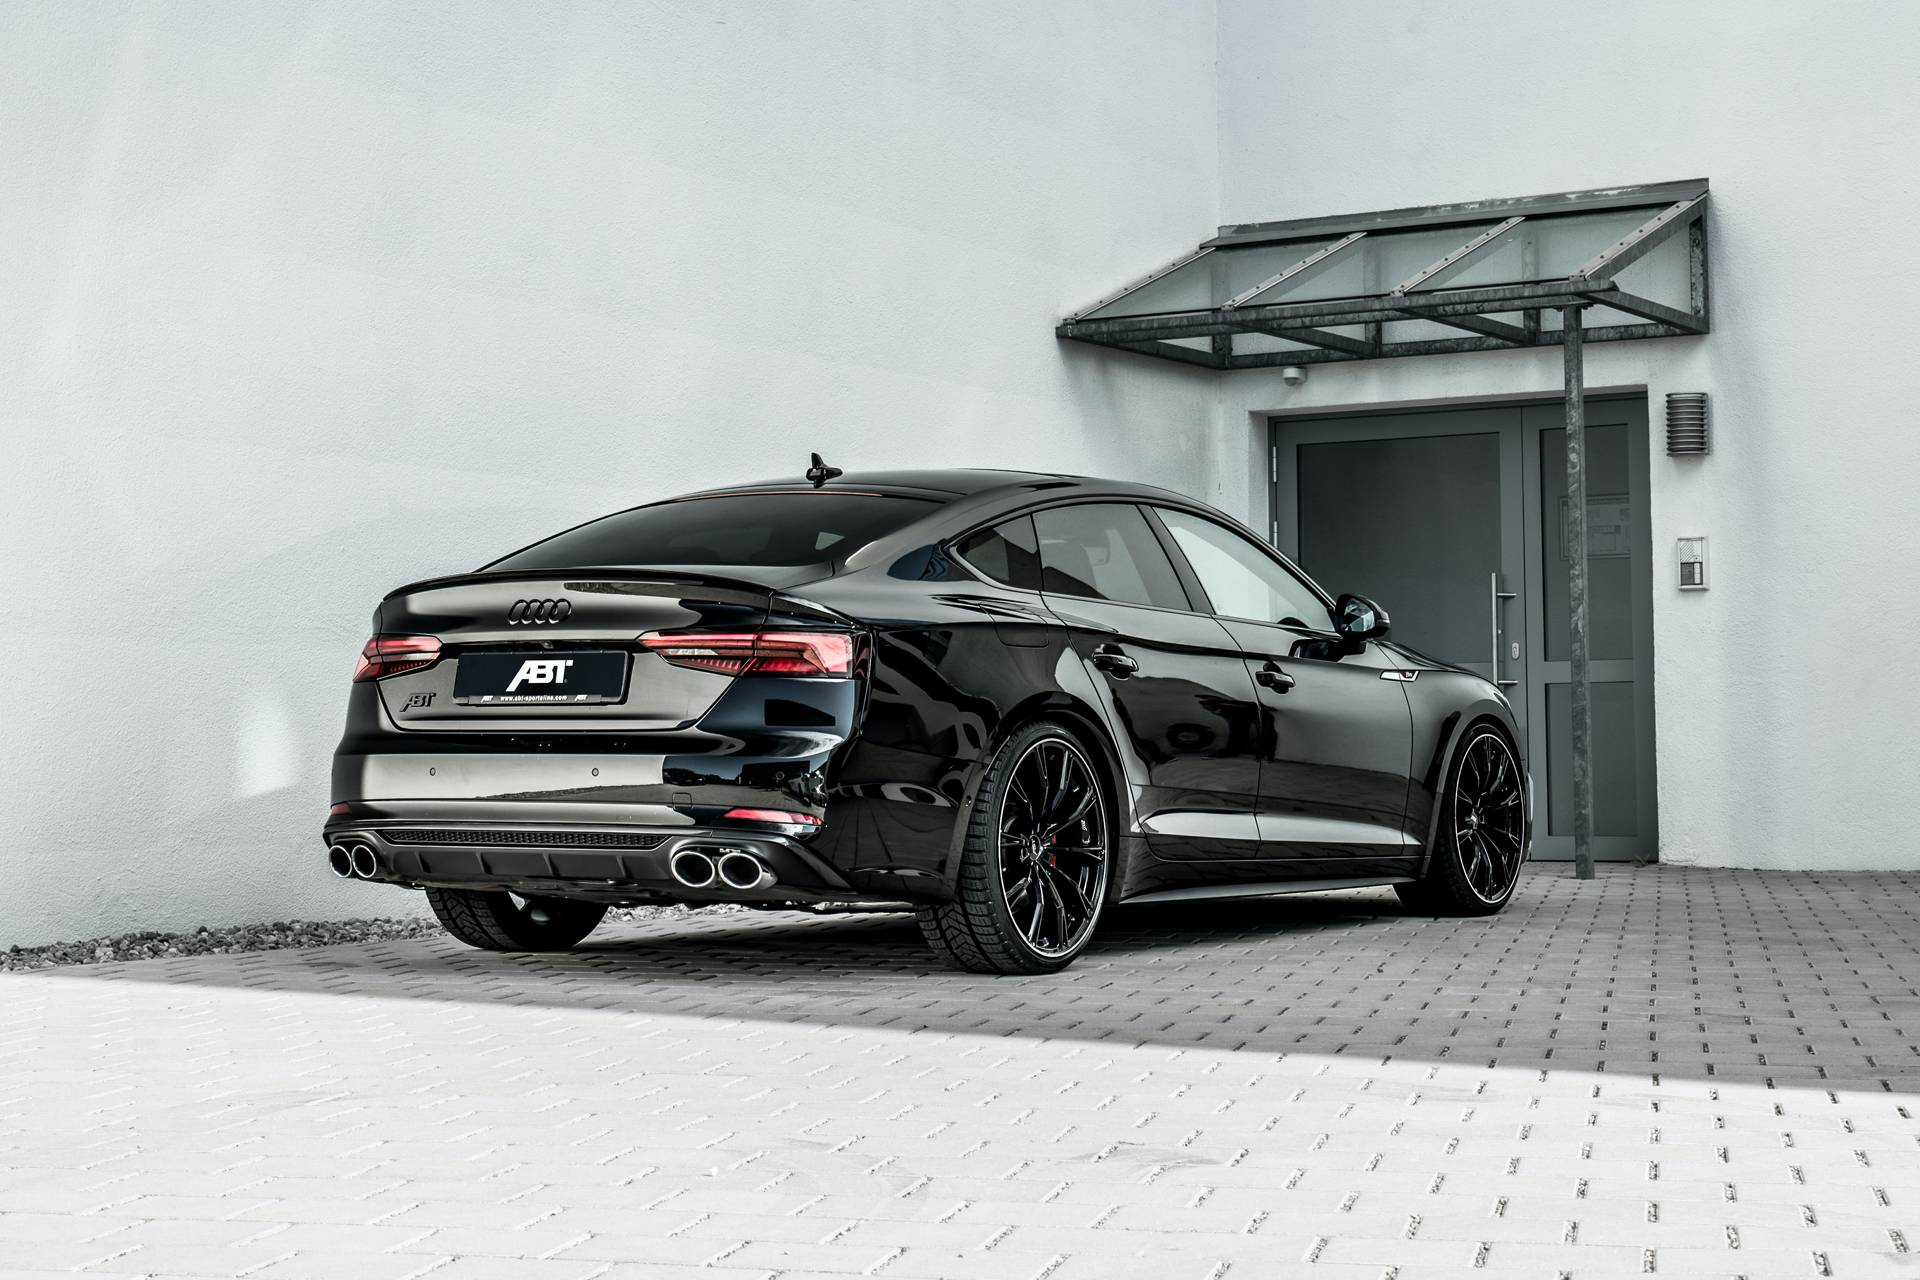 Audi-S5-Sportback-TDI-by-ABT-Sportsline-6